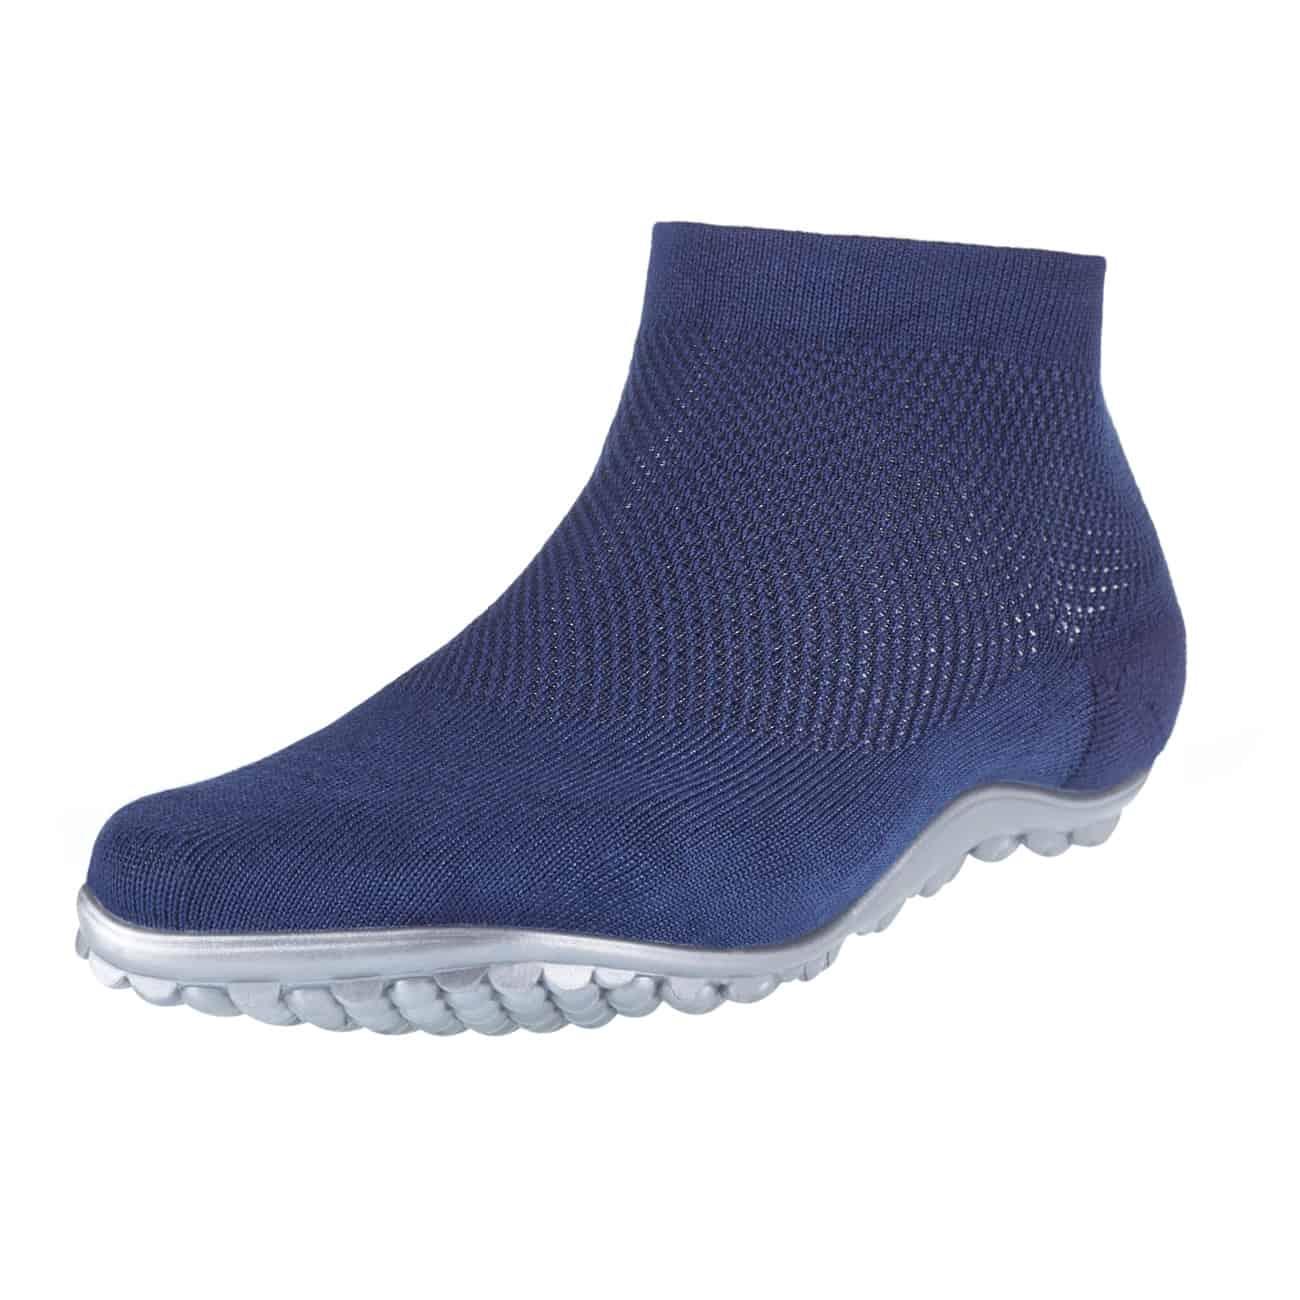 Leguano Blue Barefoot Sneakers